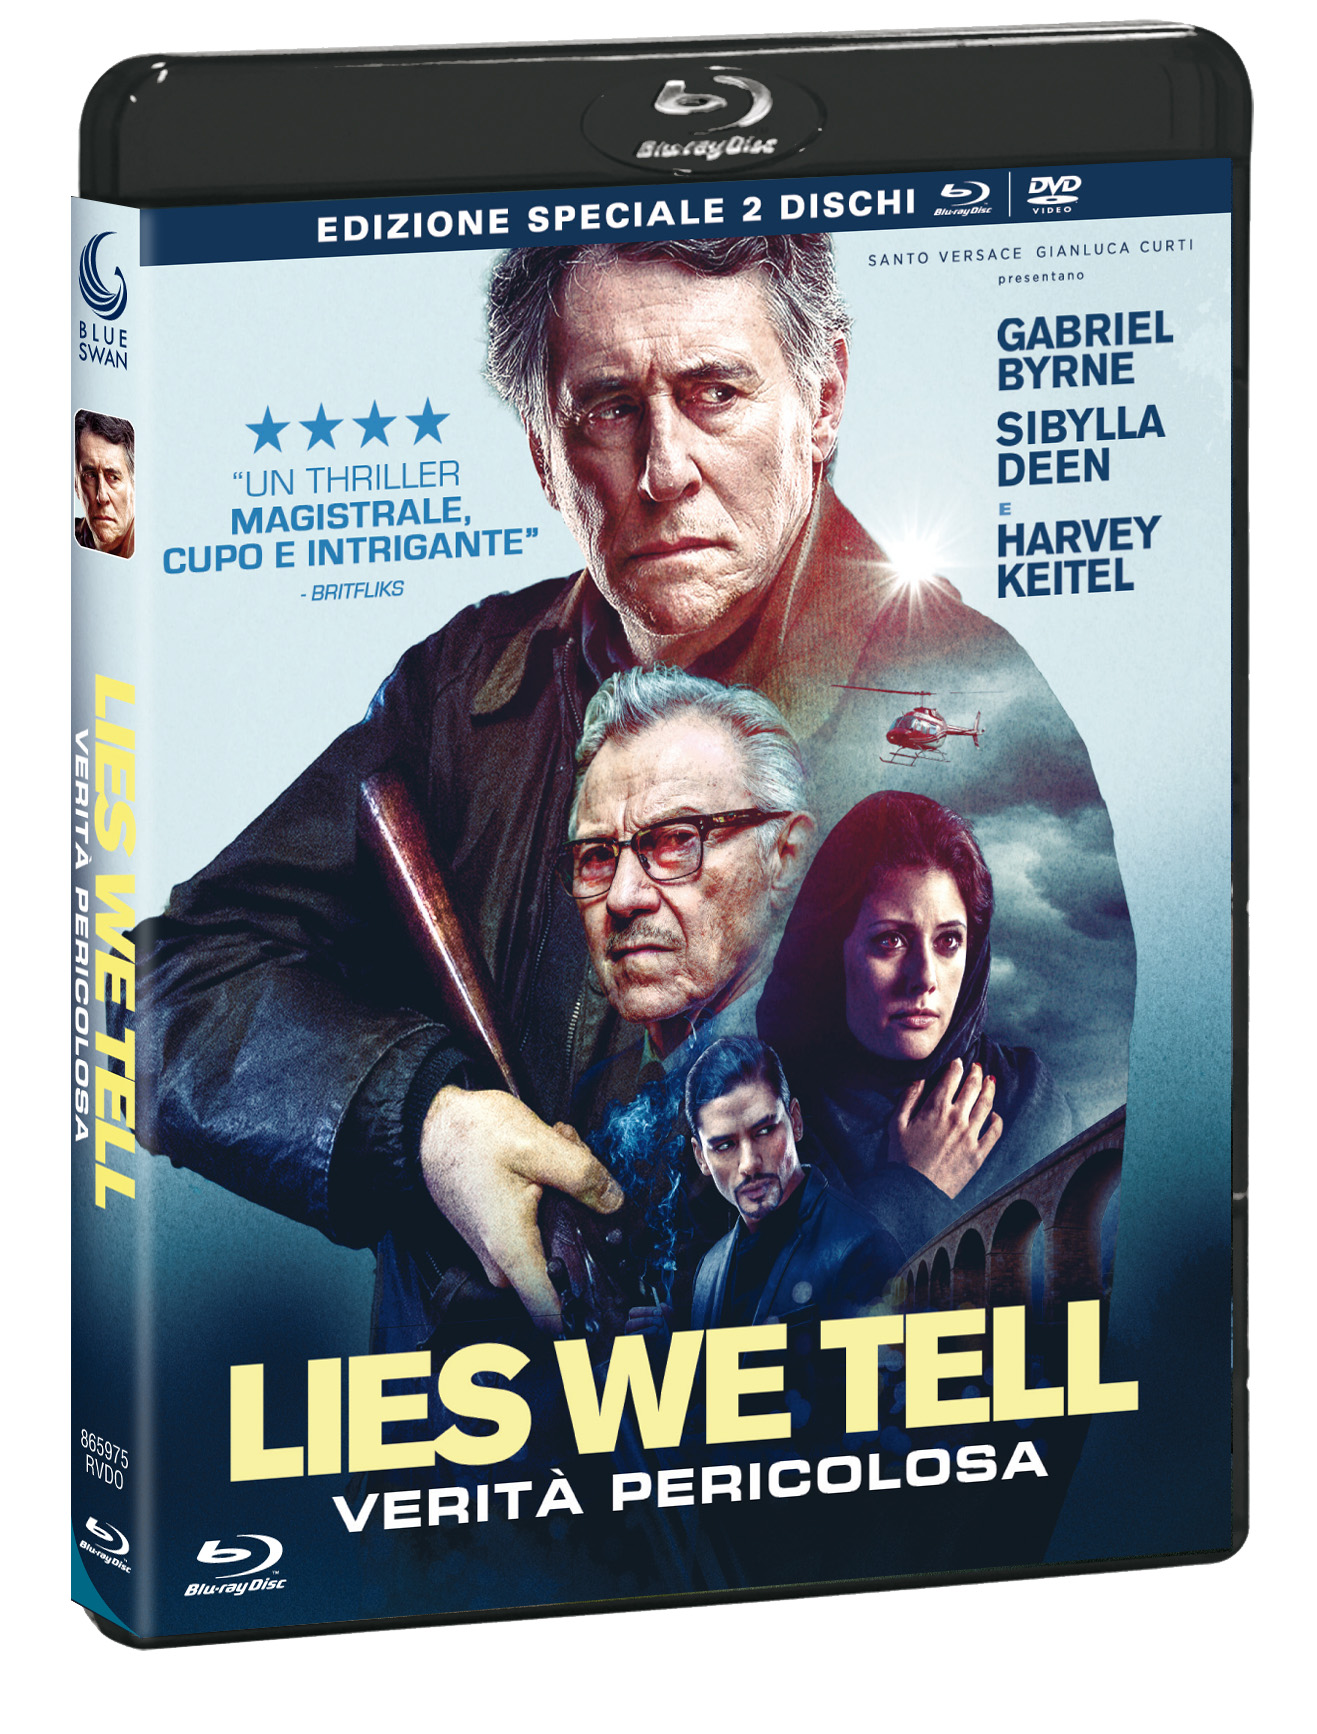 LIES WE TELL - VERITA' PERICOLOSA (BLU-RAY+DVD)